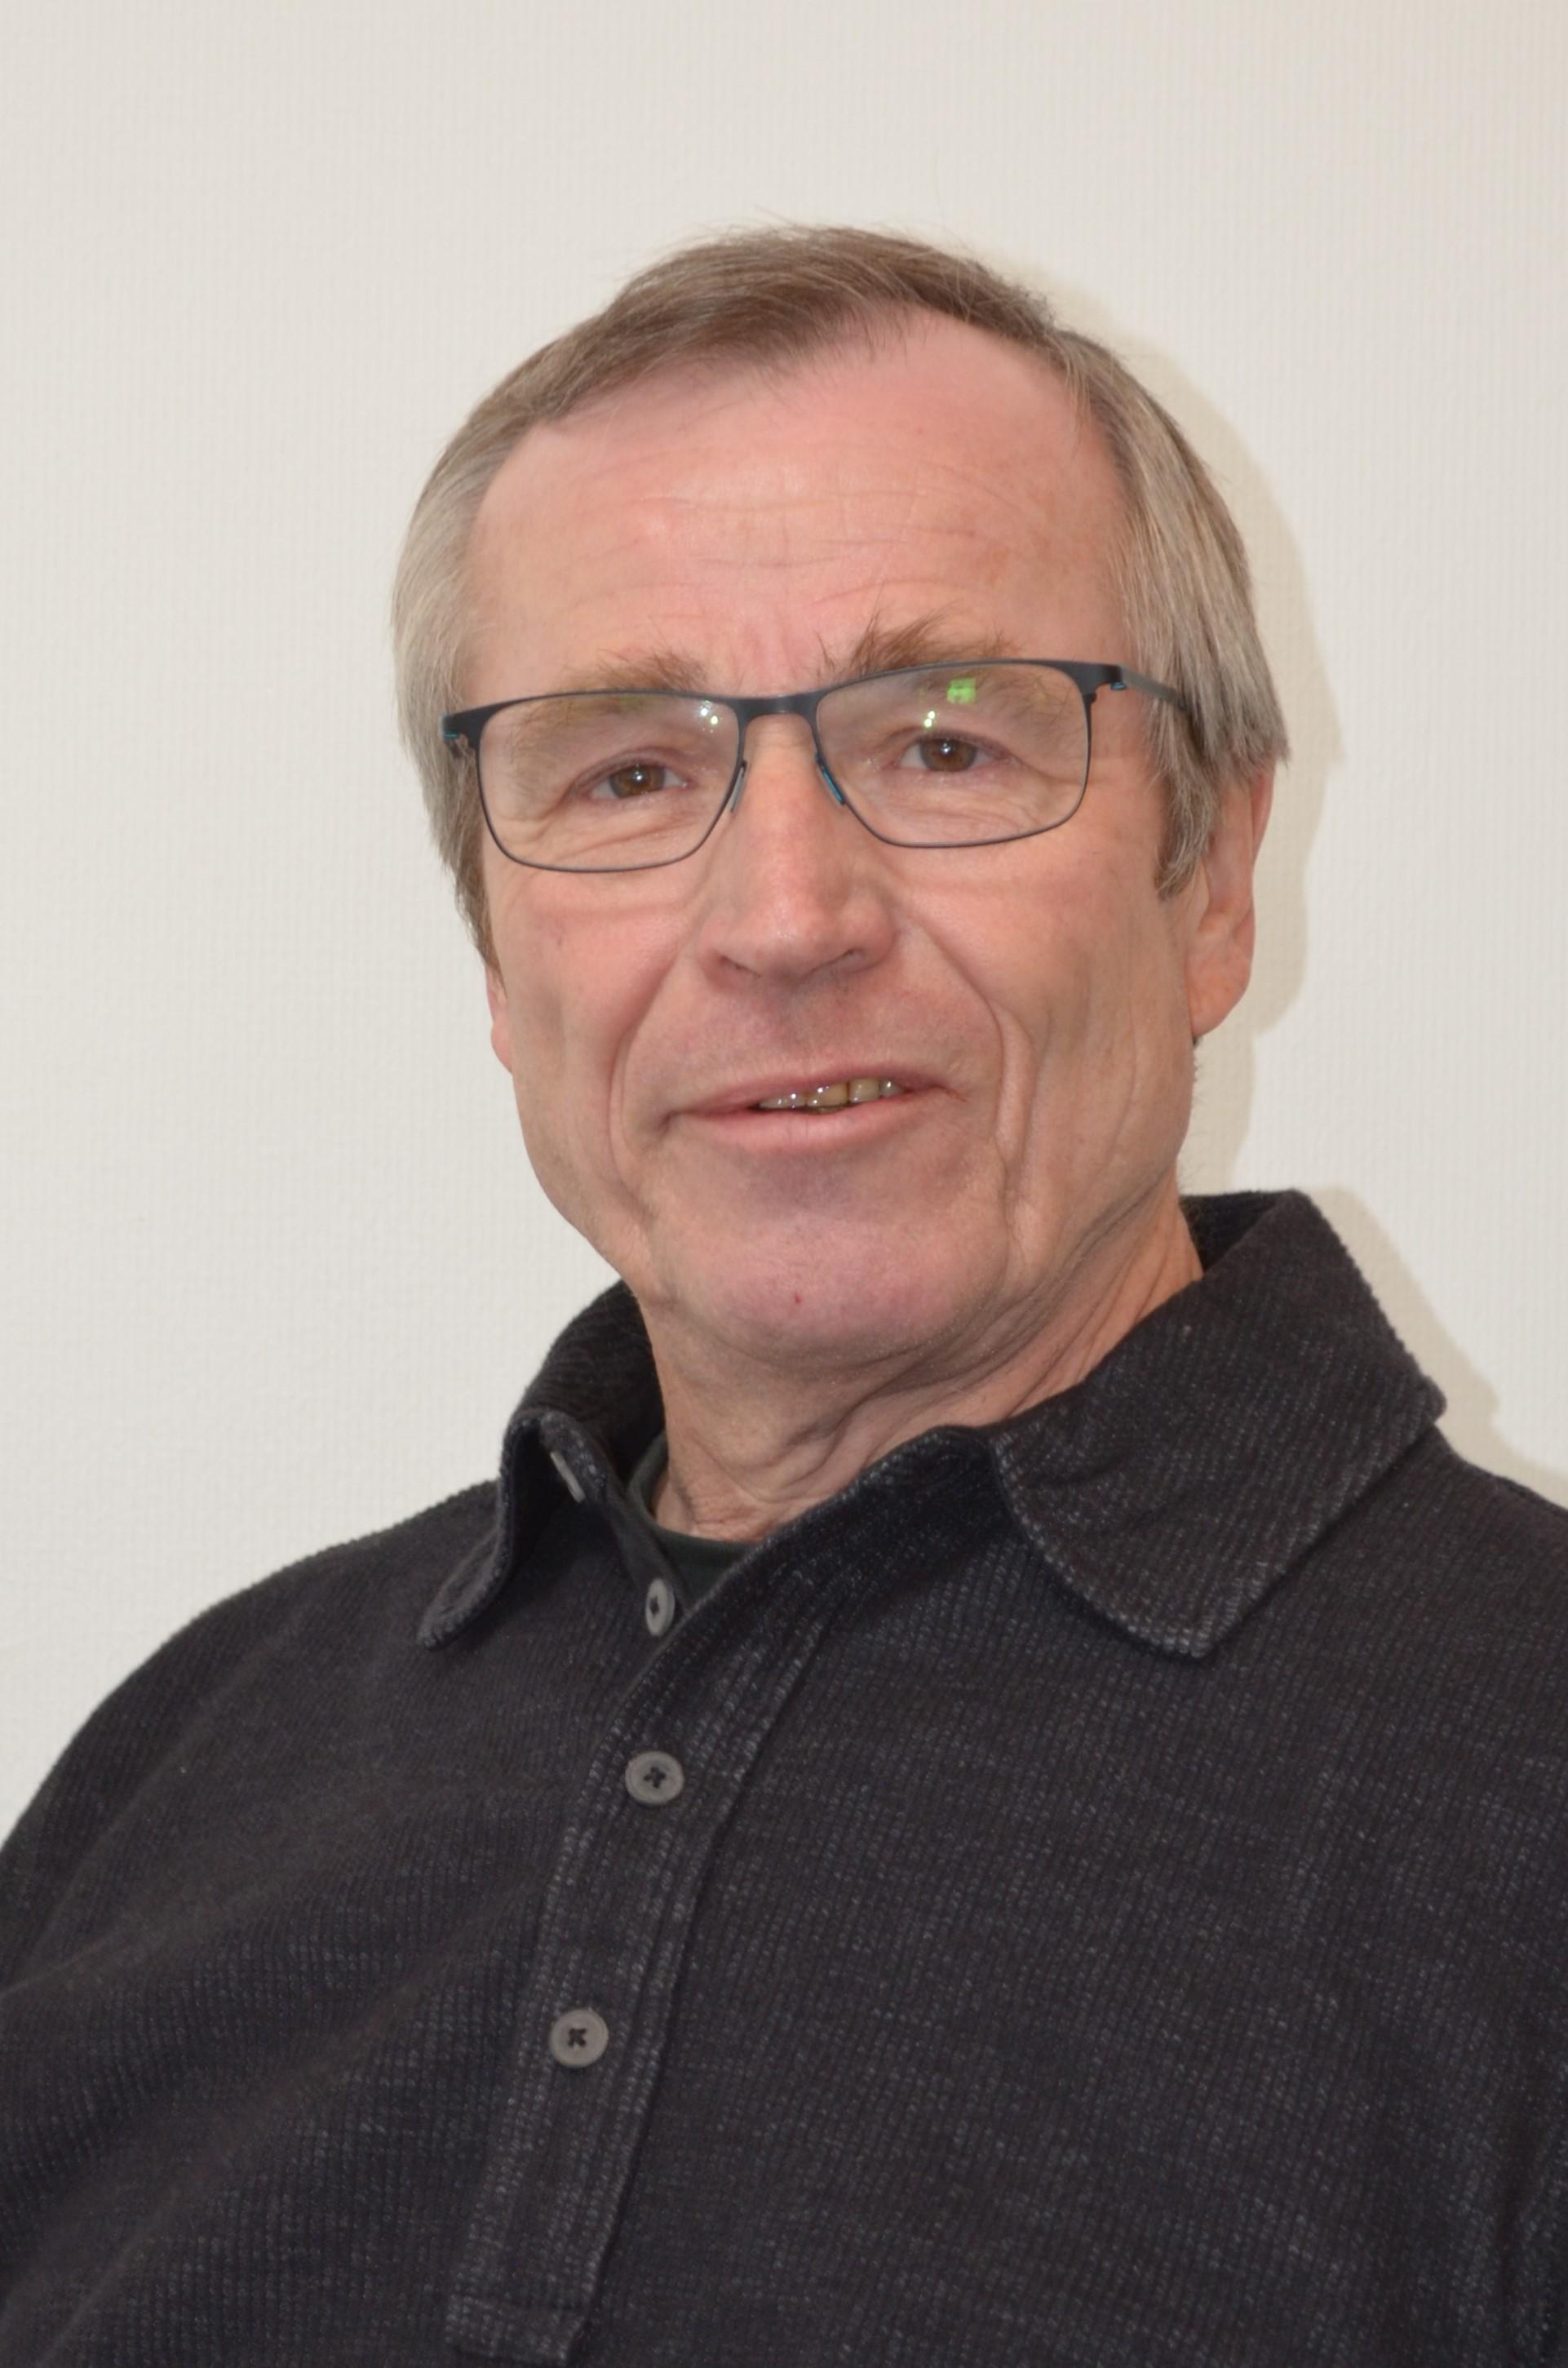 Svend Gabe